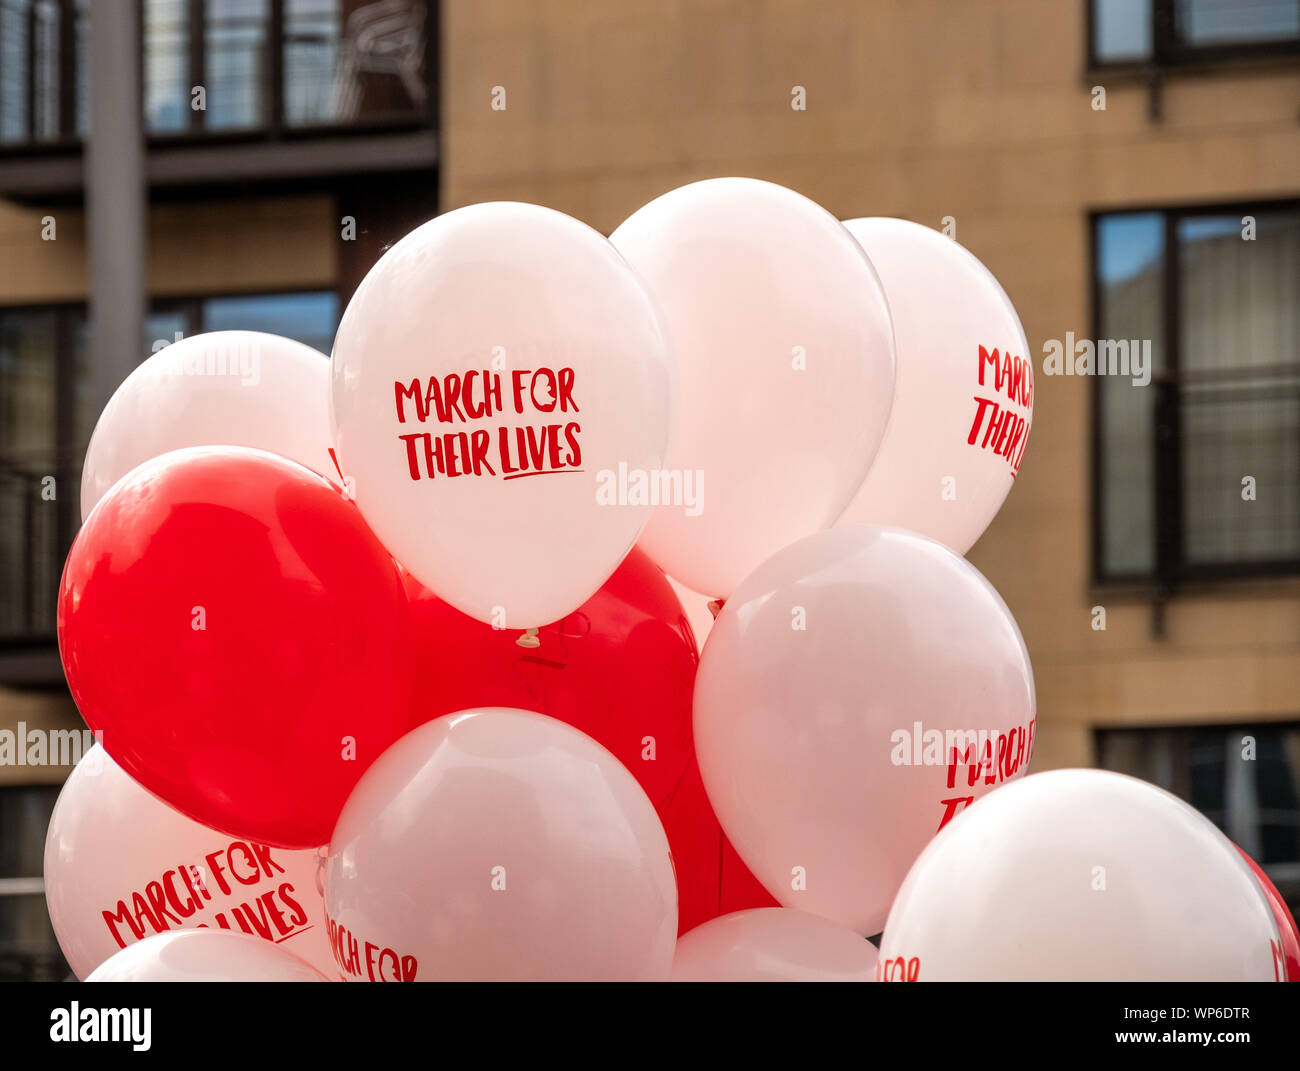 Belfast, Irlanda del Norte, Reino Unido - 7 de septiembre de 2019: Marcha para sus vidas anti aborto Rally, Custom House Square, Belfast Foto de stock